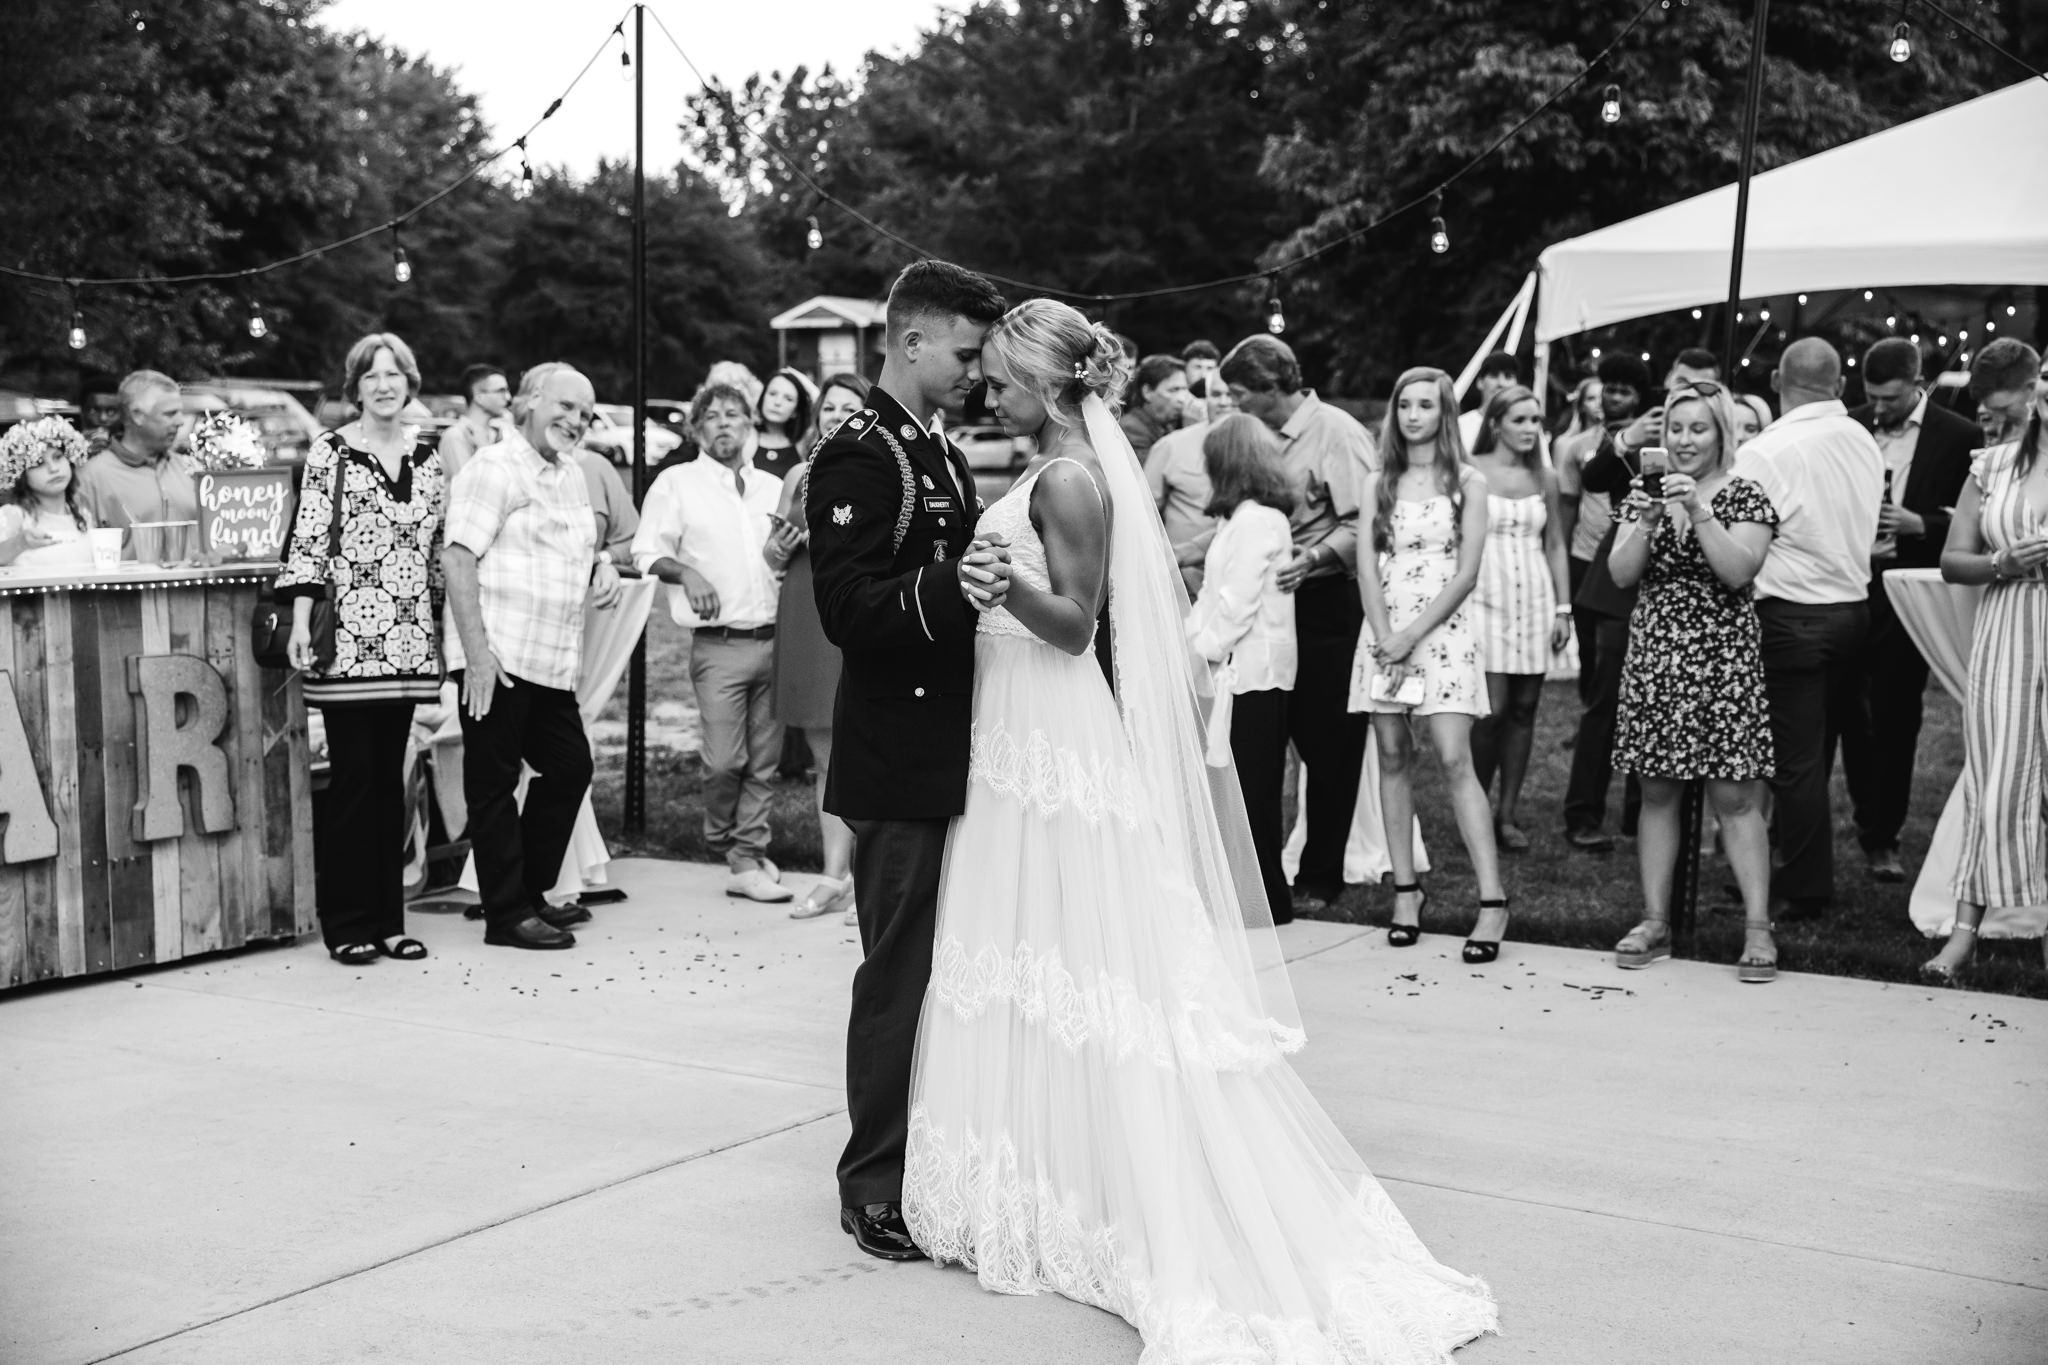 backyard-wedding-thewarmtharoundyou-lexy-branson-22.jpg